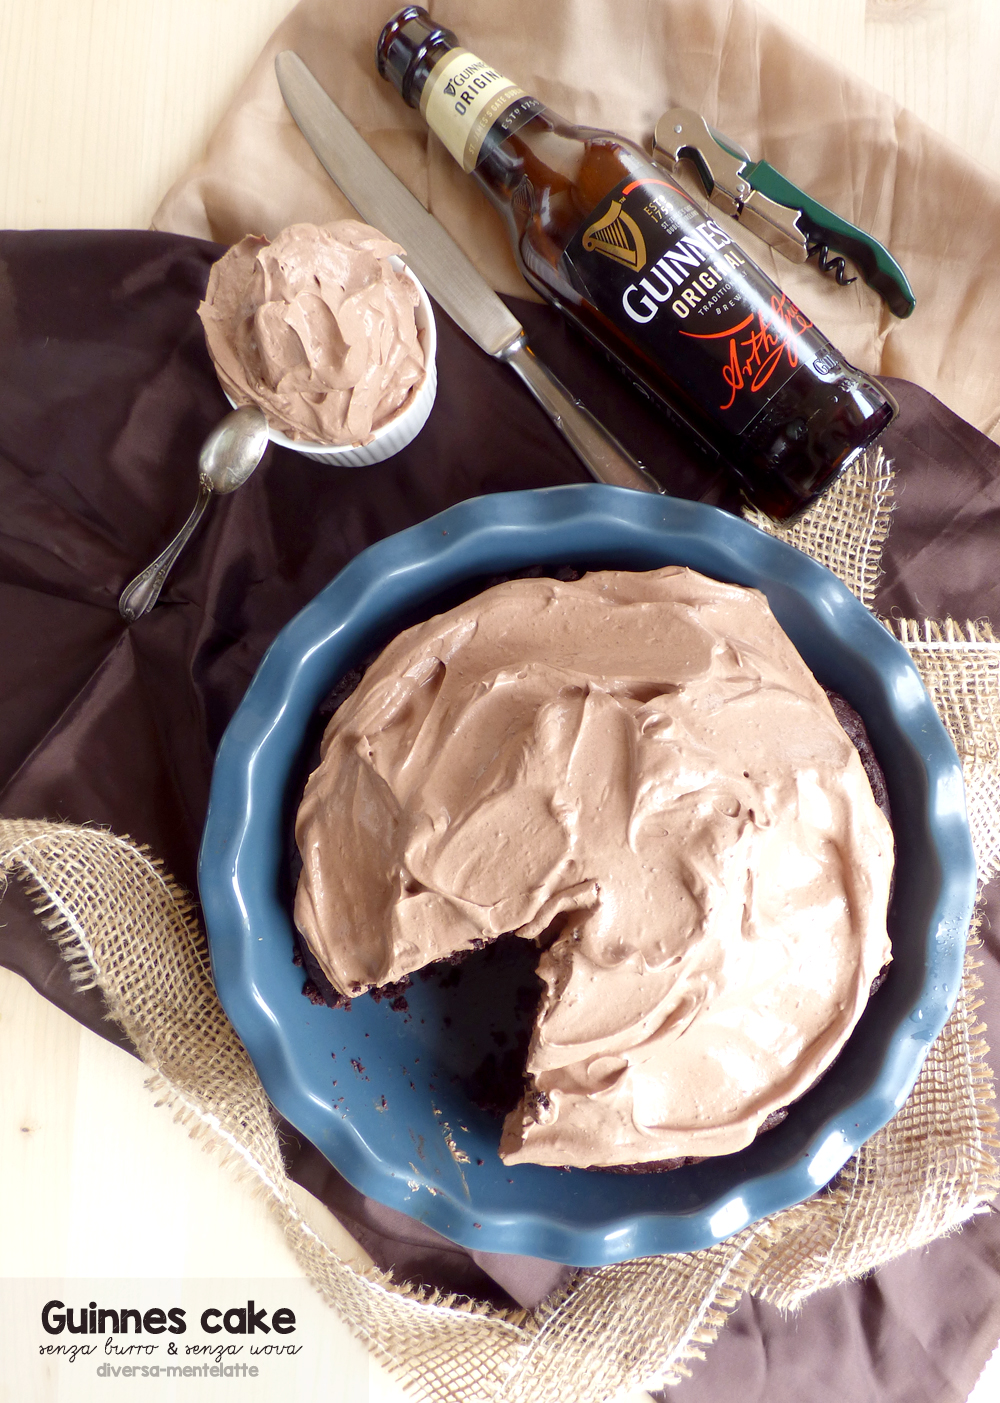 guinnes cake senza lattosio